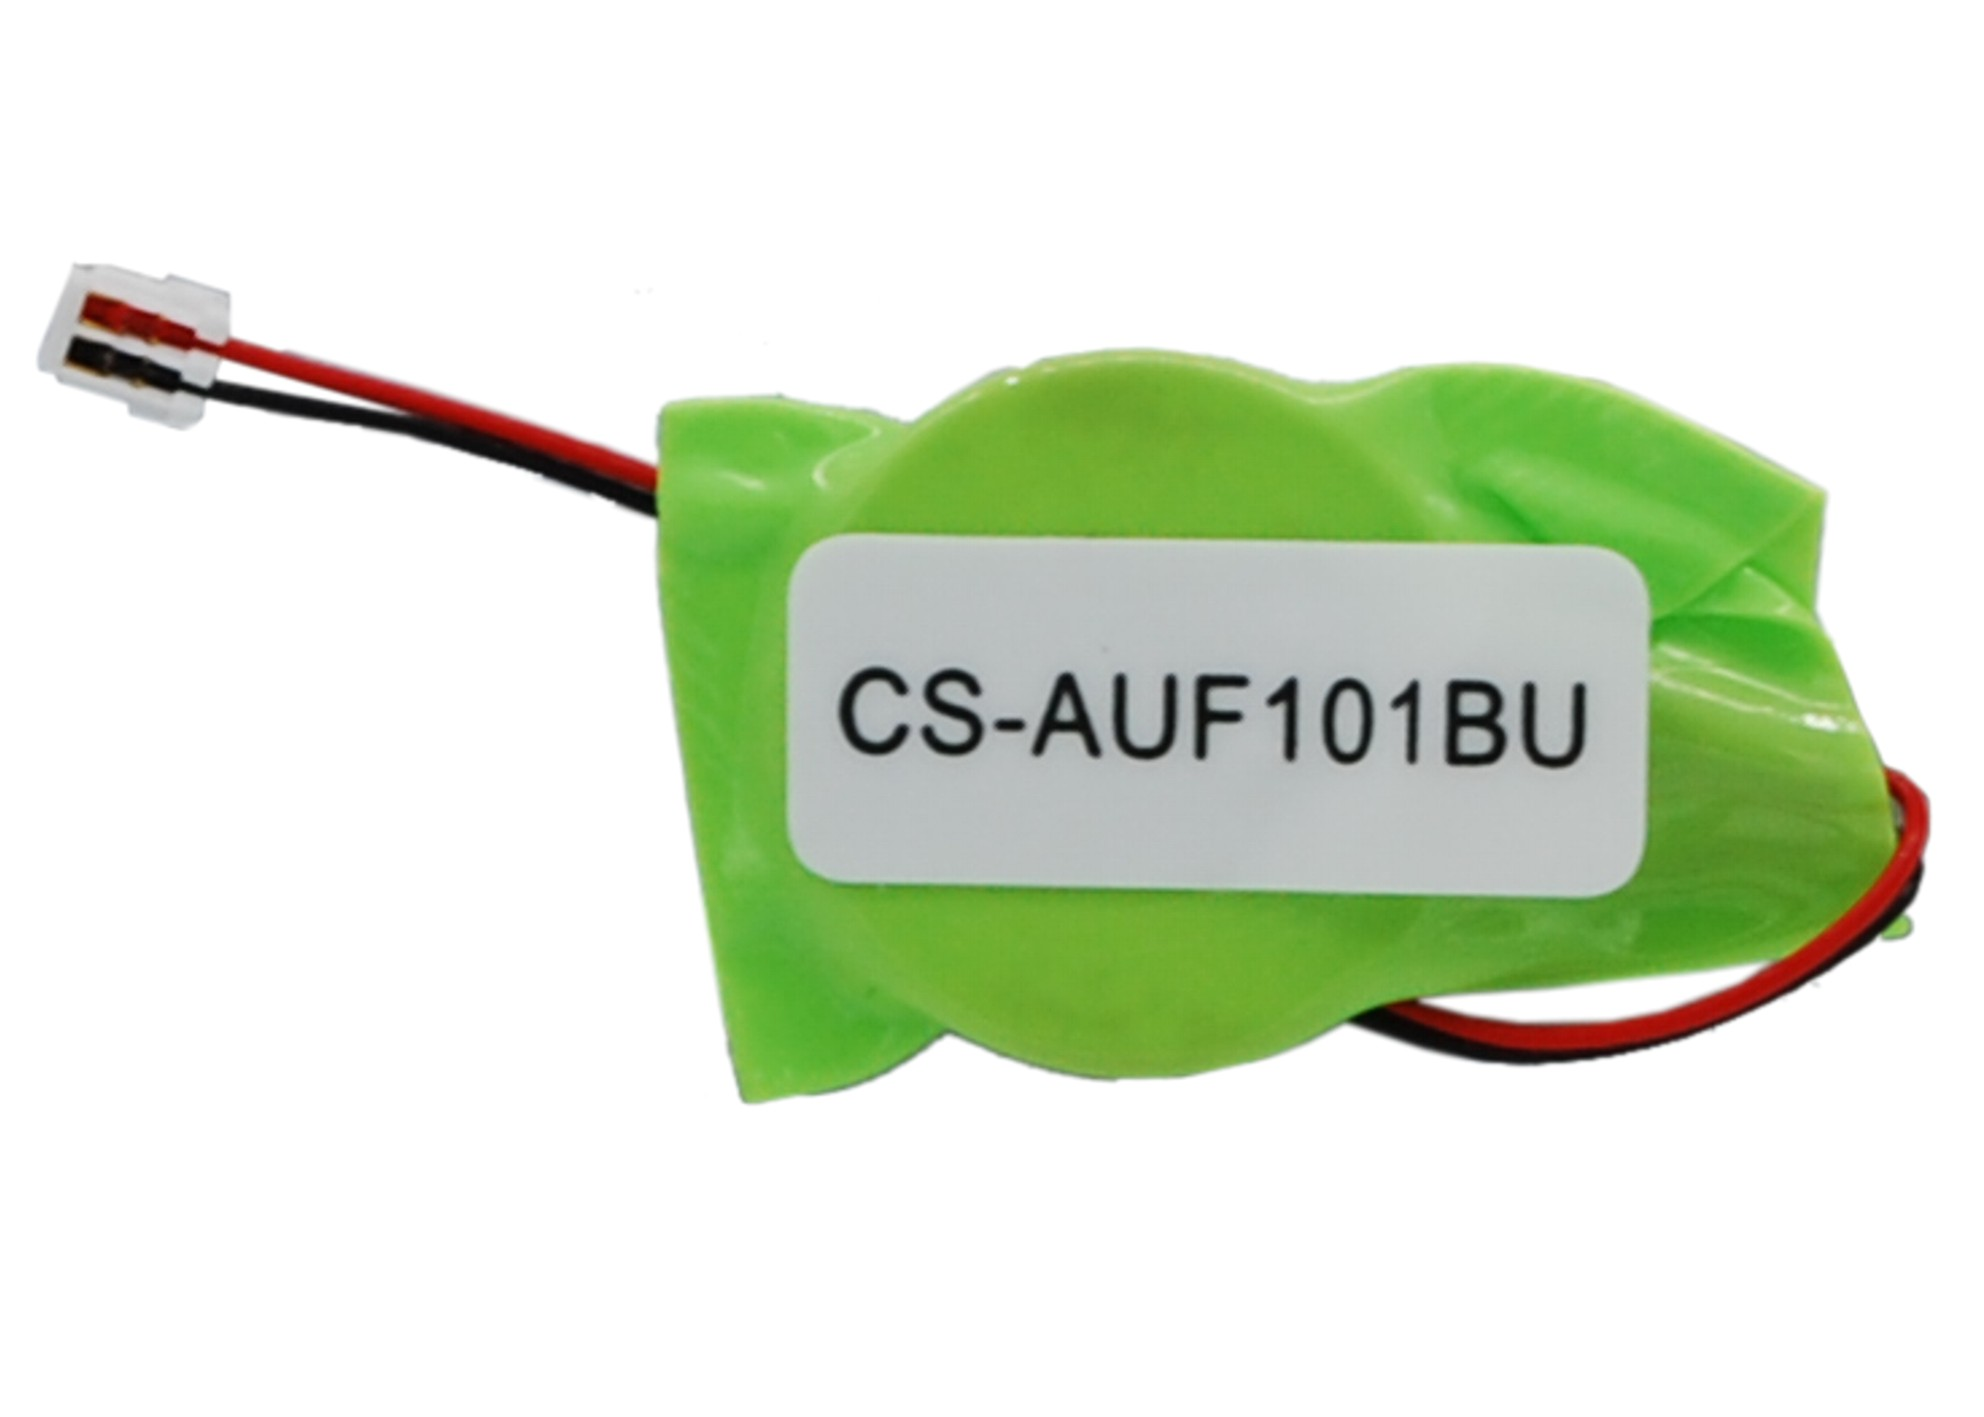 Cameron Sino baterie cmos pro ASUS Eee Pad Transformer TF101-1B135A 3V Li-ion 40mAh zelená - neoriginální